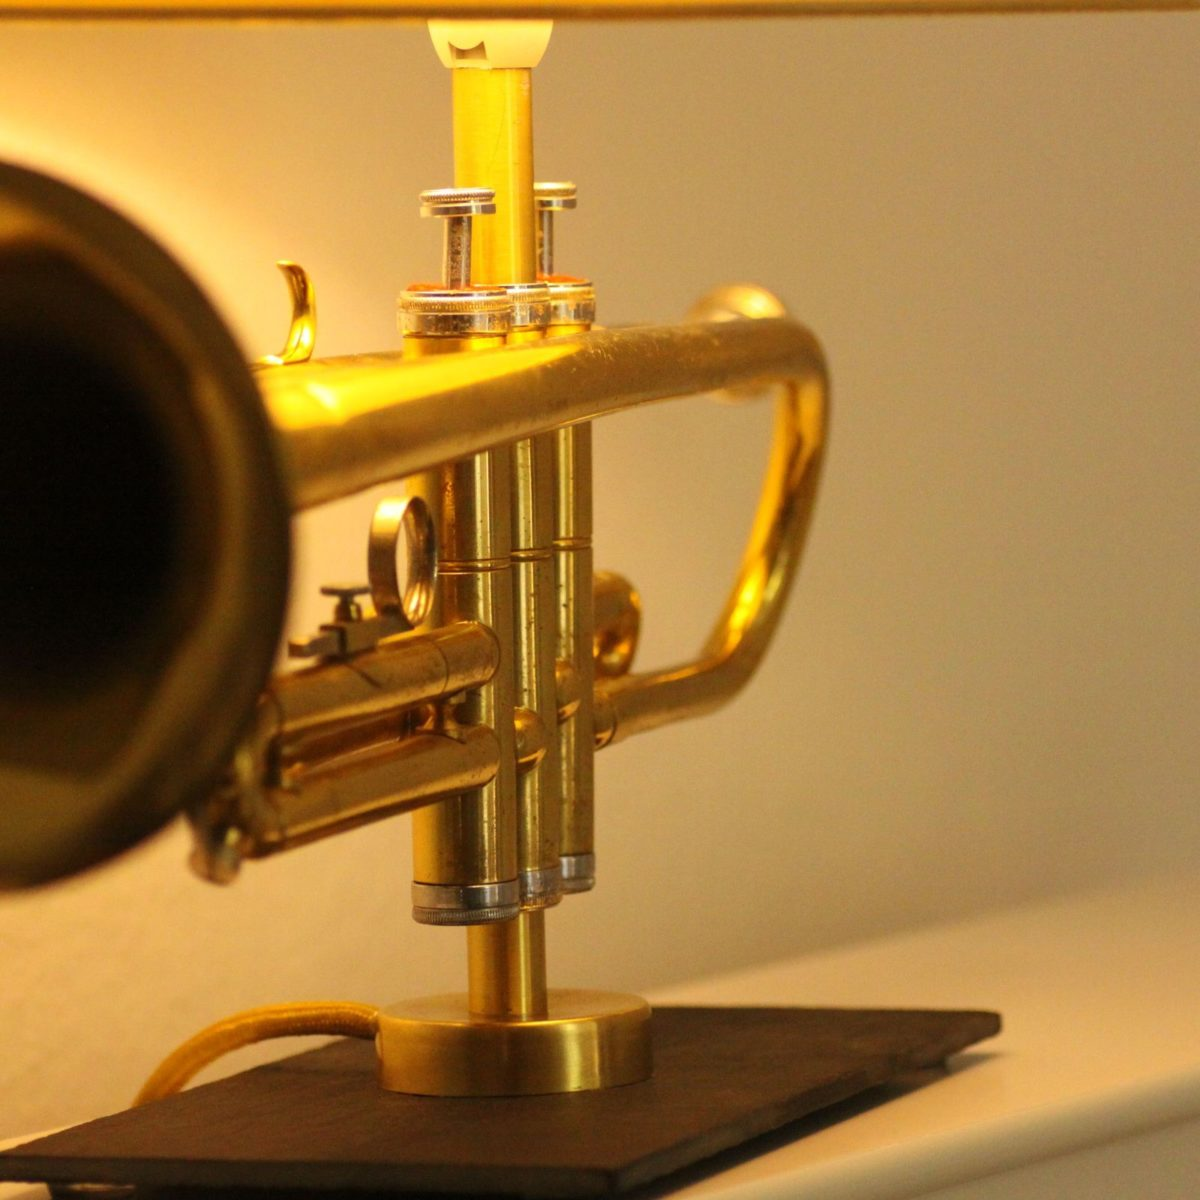 Trompete_Lampe_Vintage_Design_#01A